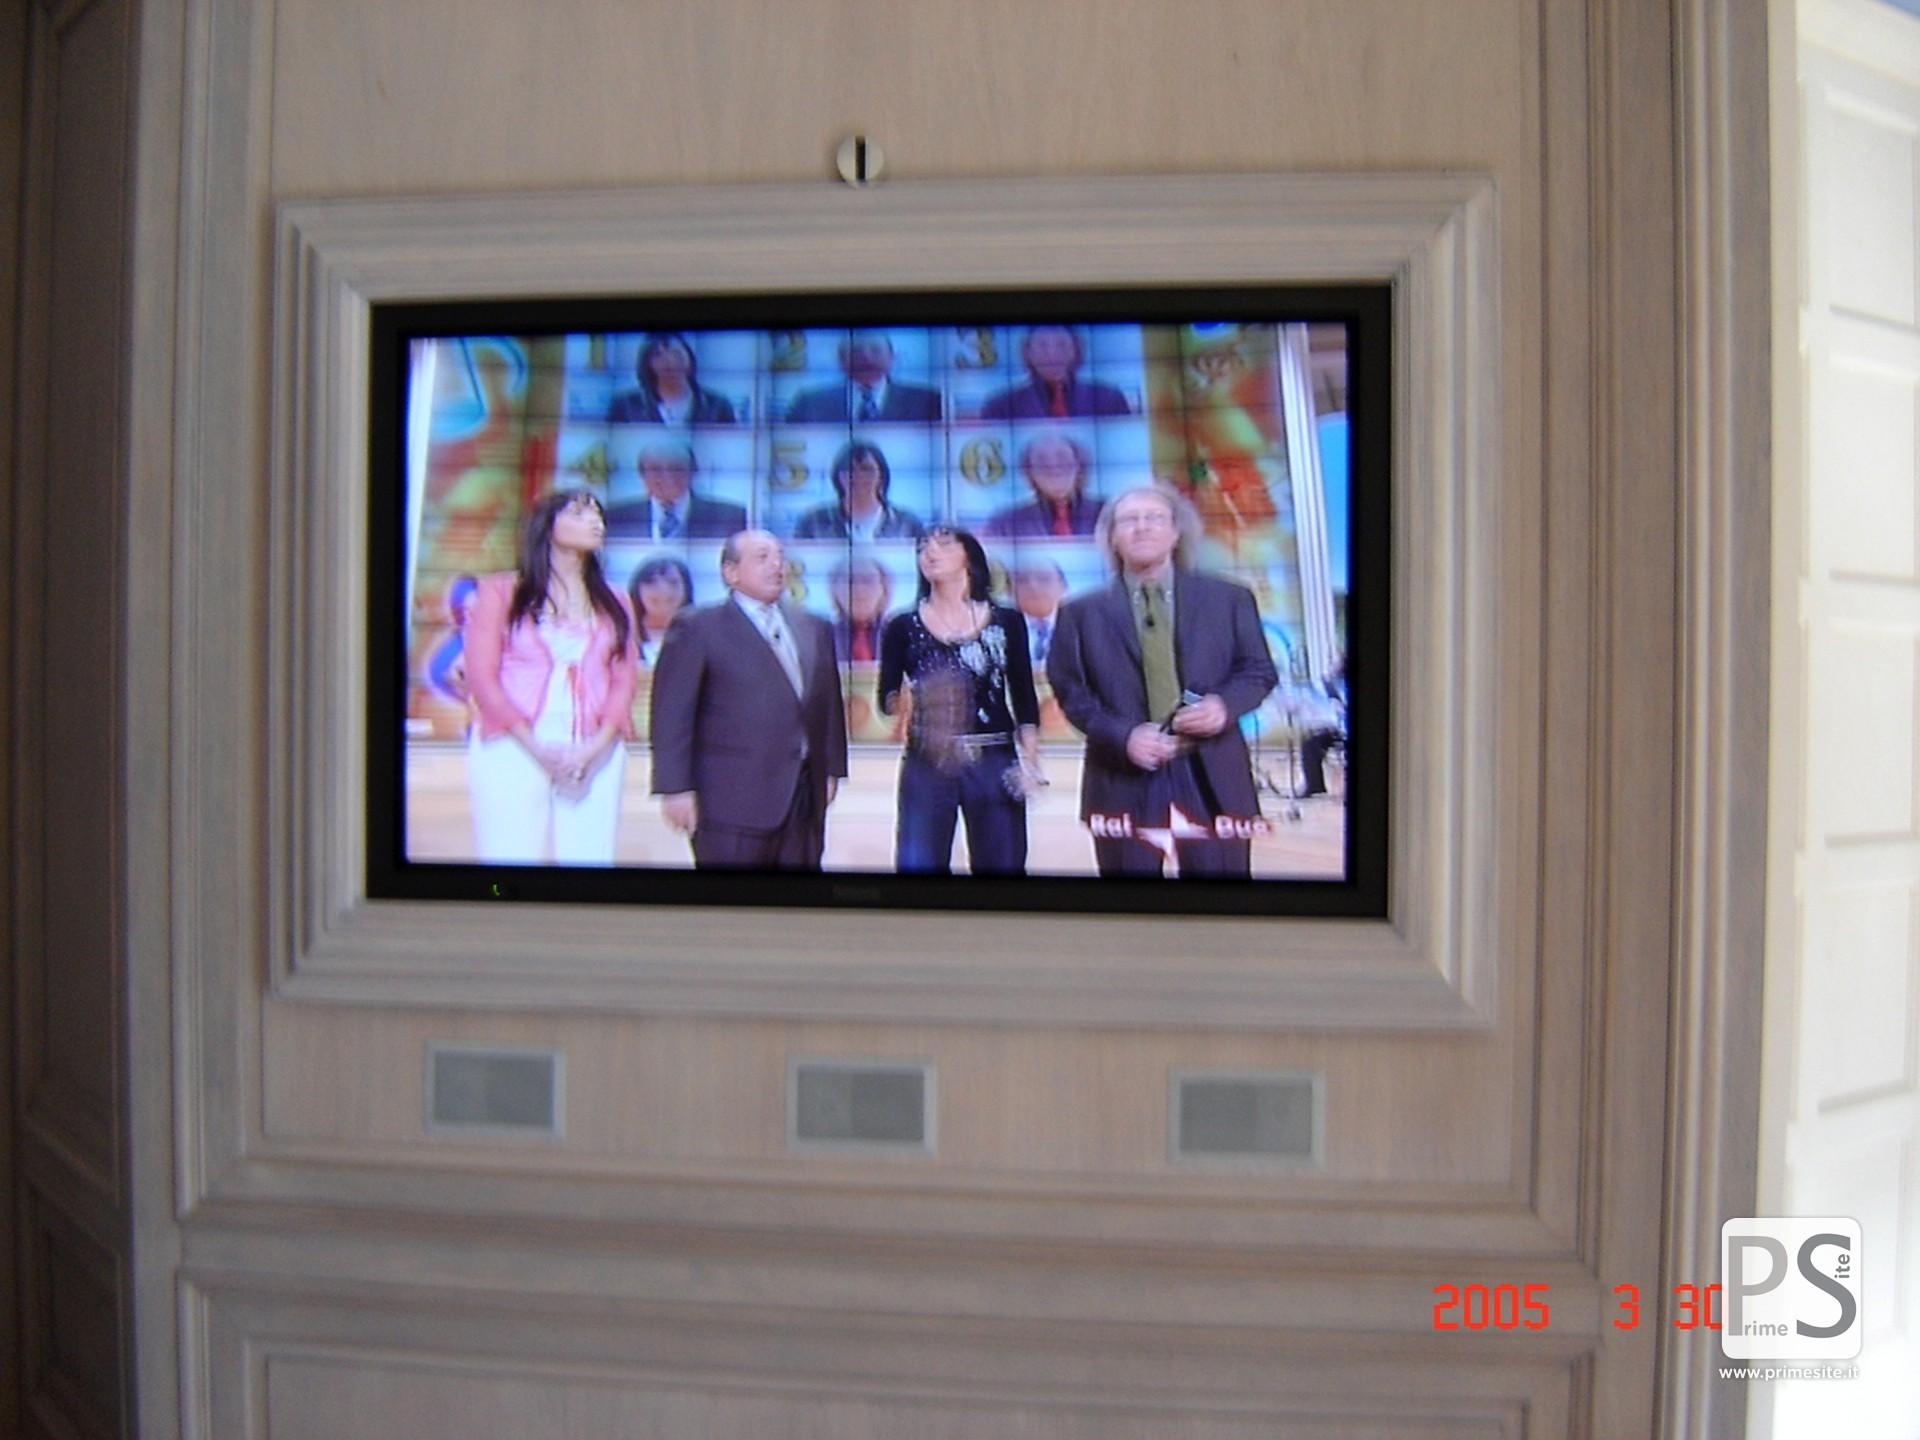 Custom tv frames prime site bang olufsen milano - Cornici per foto ikea ...